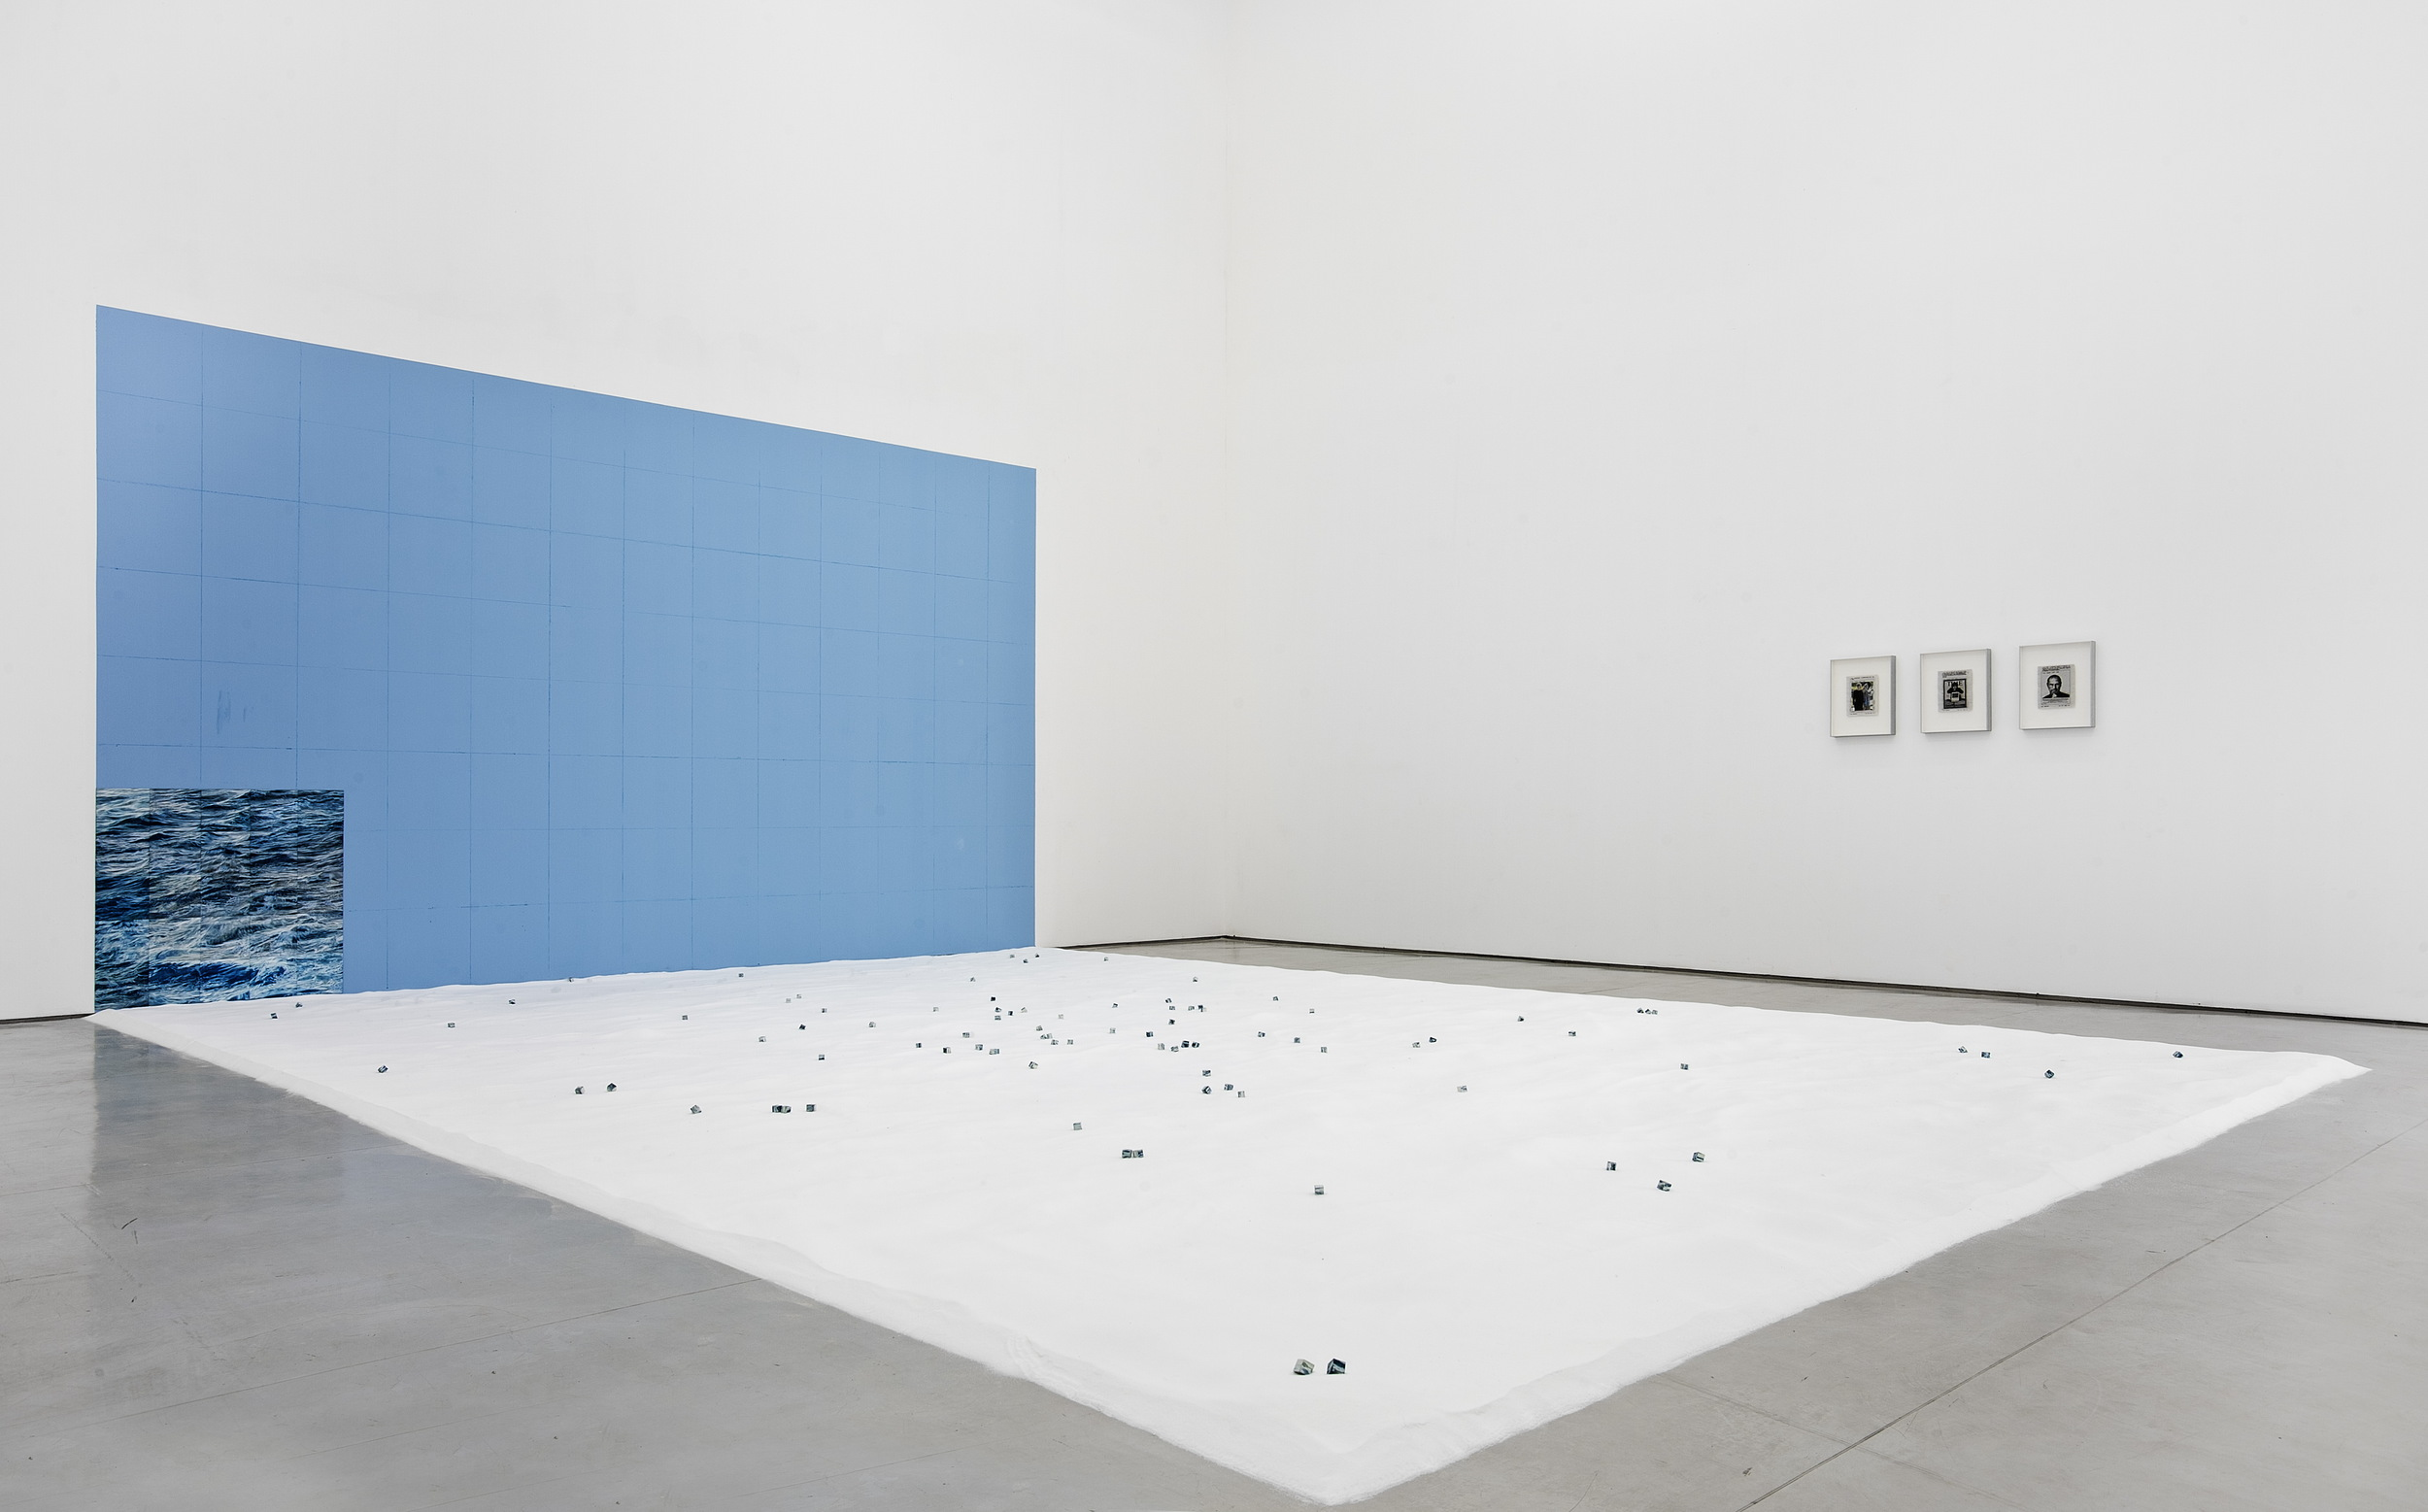 Liu Ren 刘任, Filling the Sea - Sea Cubes 填海-海粒, 2011 - 2013, Oil on acrylic board and sea salt 油画在亚克力板上、海盐, Dimension variable 尺寸可变